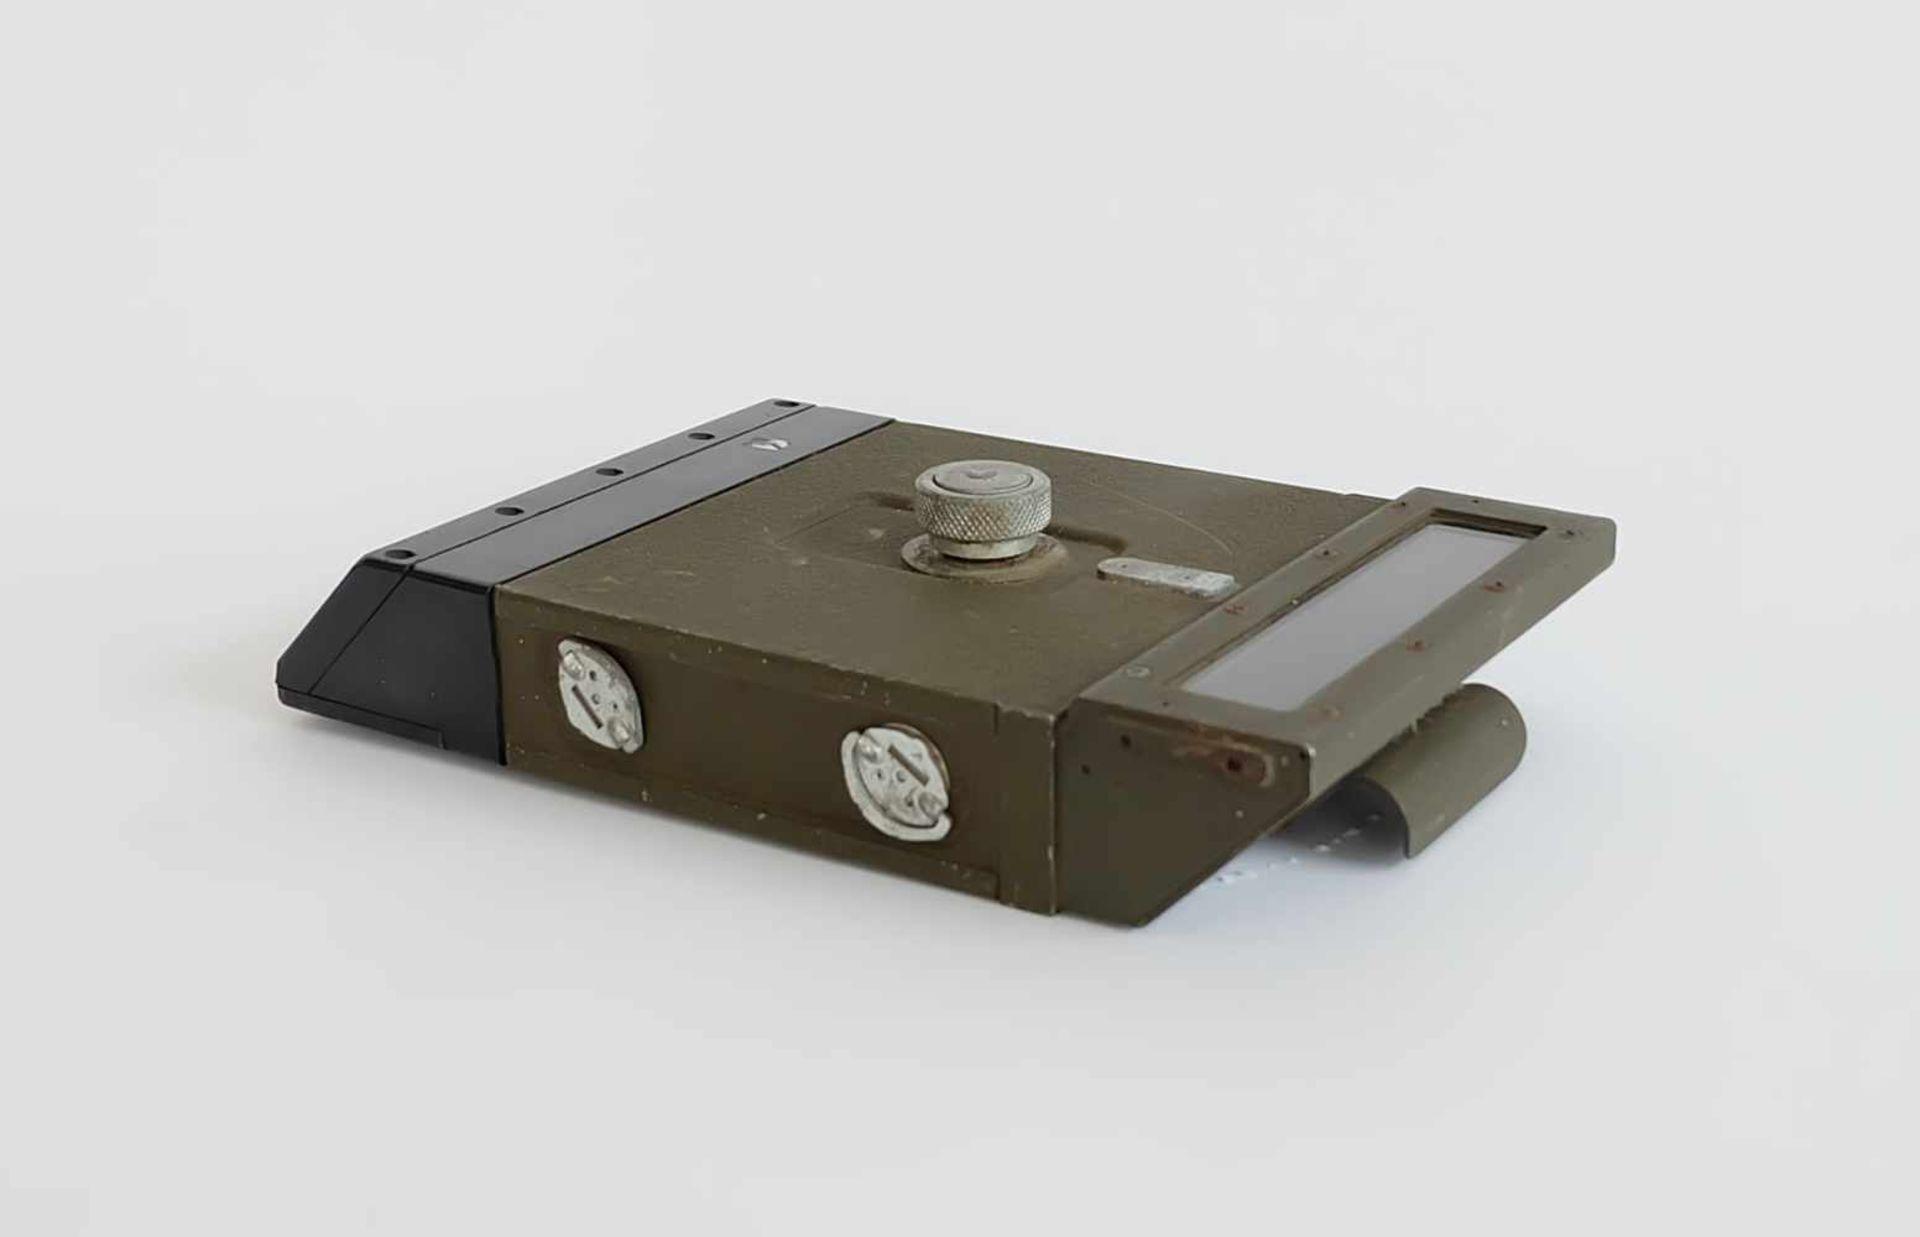 PERISKOP, Honeywell Regulator Comp./ Minneapolis, 1943, Optik für Sherman-Panzer,